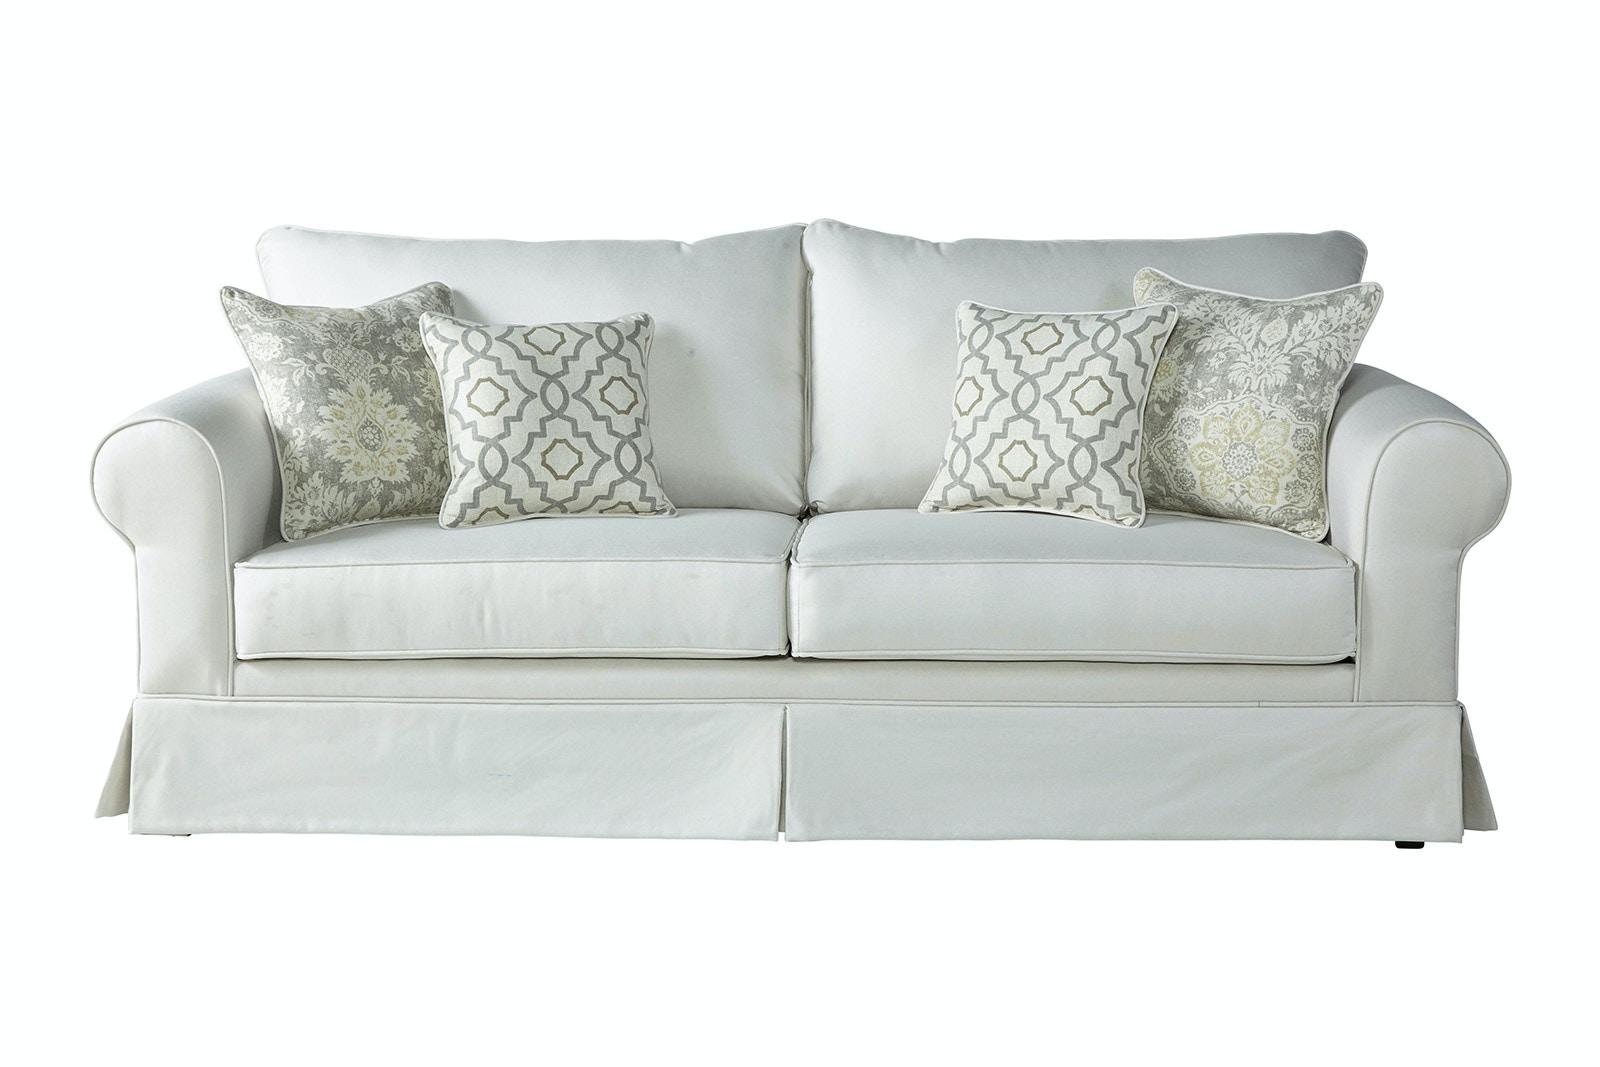 living room sofas carol house furniture maryland heights and rh carolhouse com carol house sofa sleepers Carol House Furniture Website